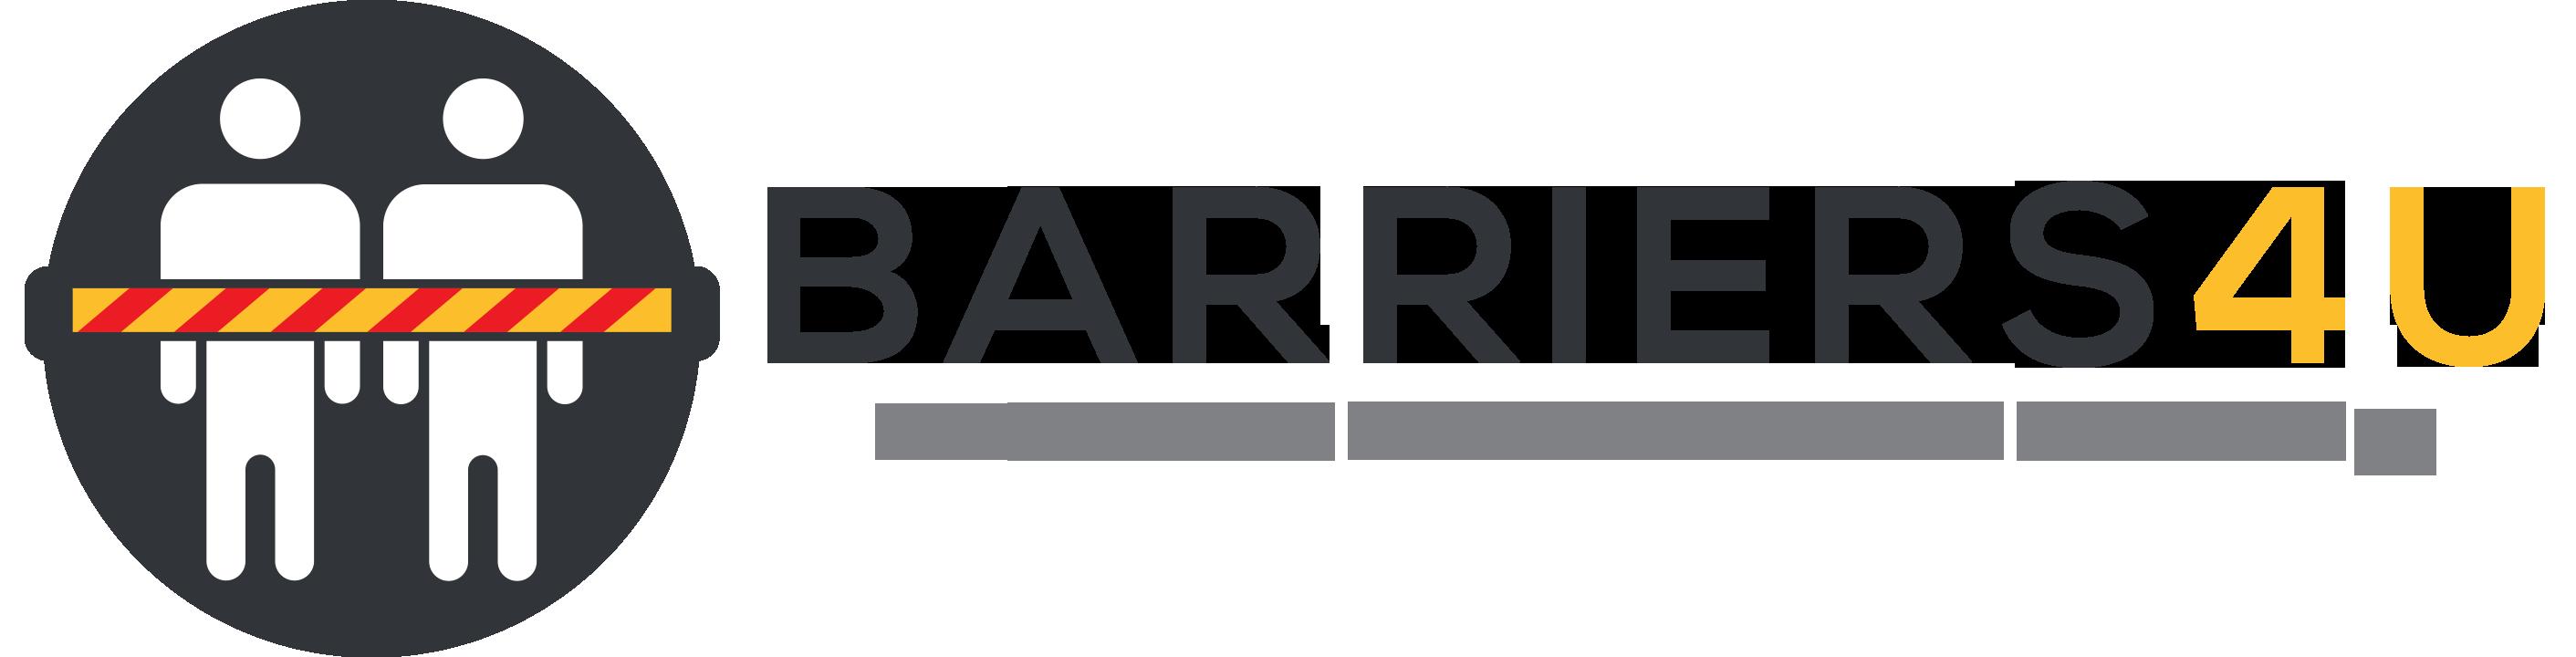 Barriers4u.co.uk